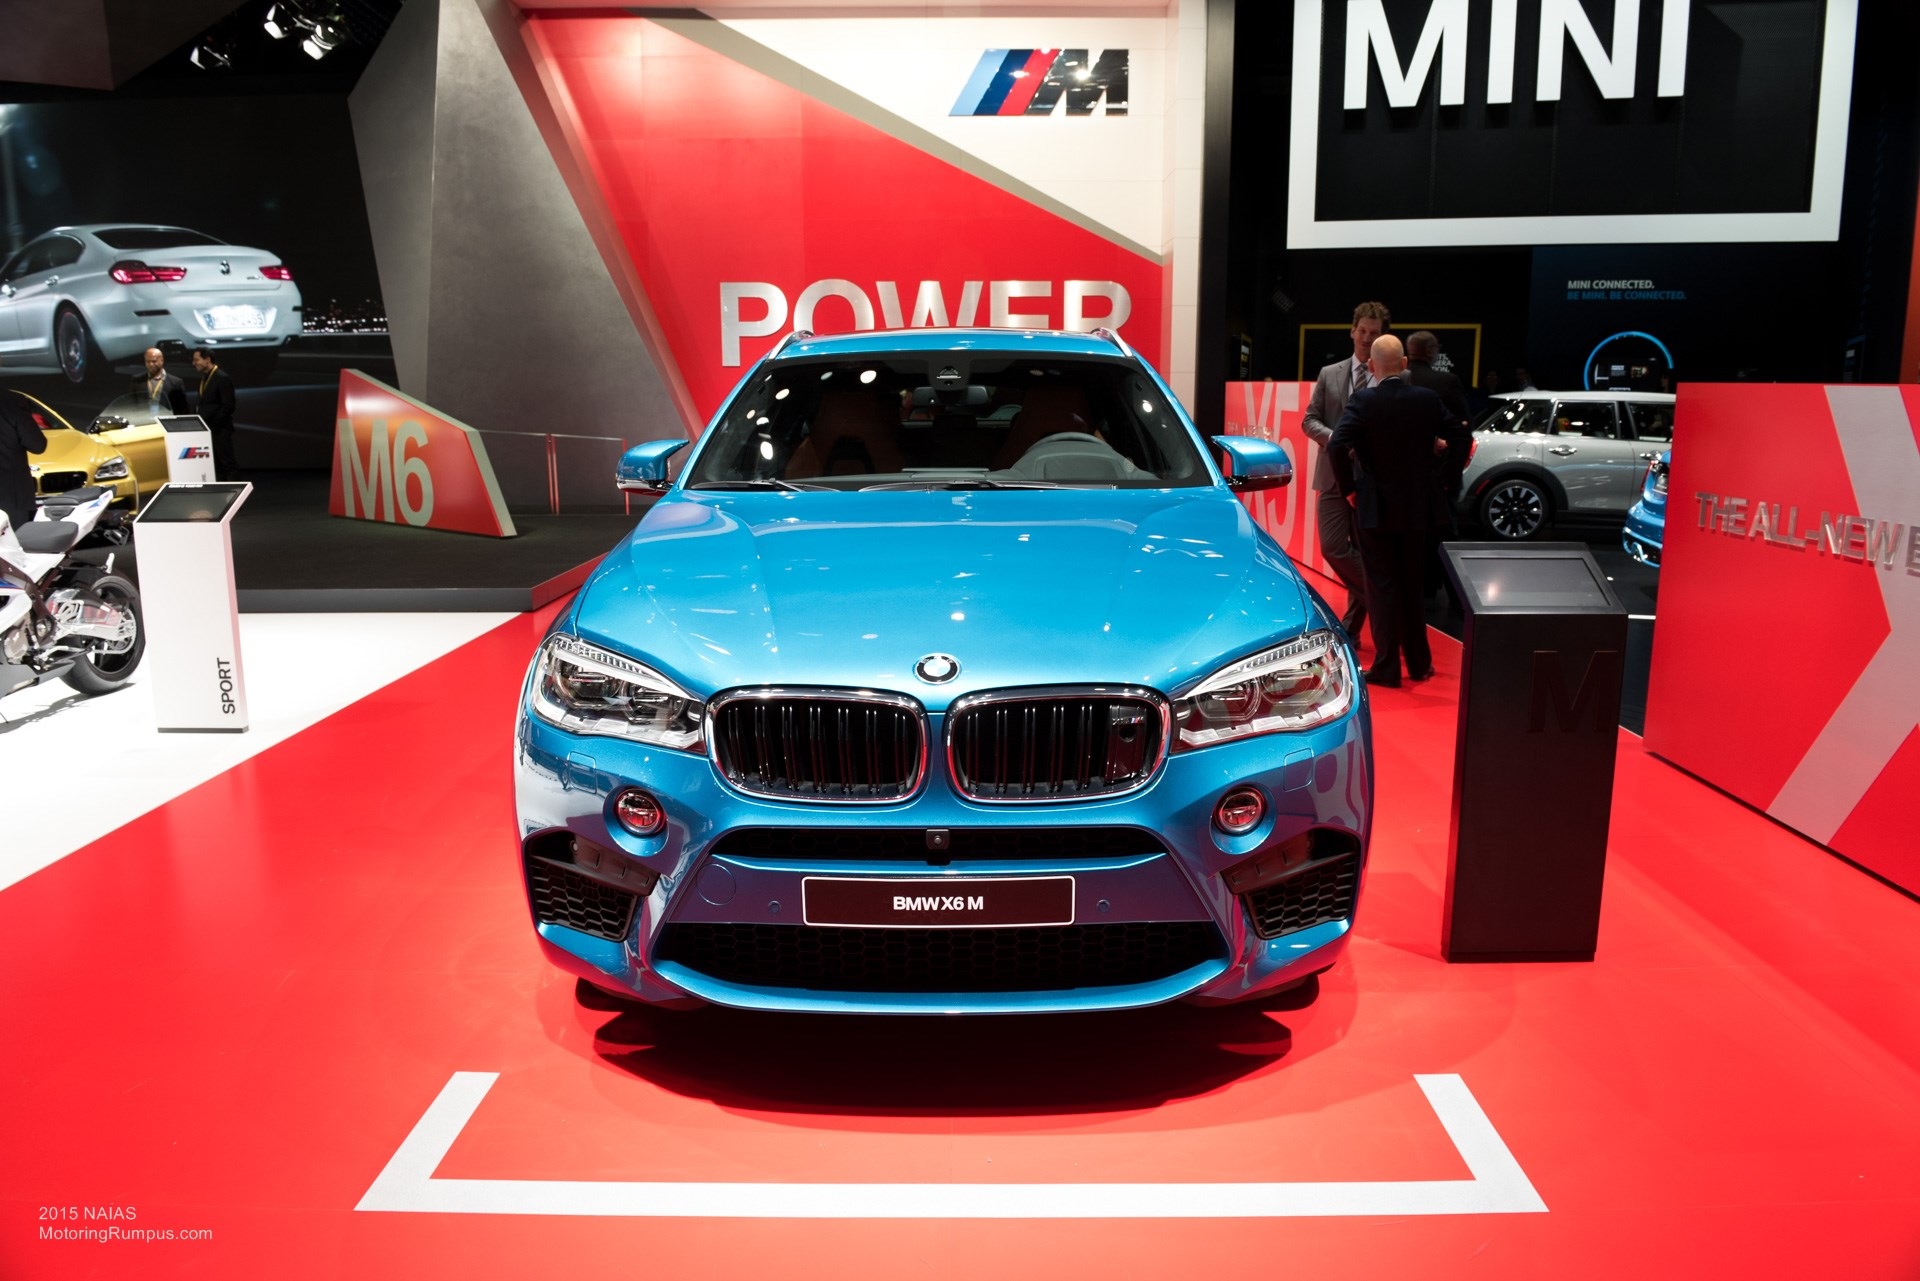 2015 NAIAS BMW X6M